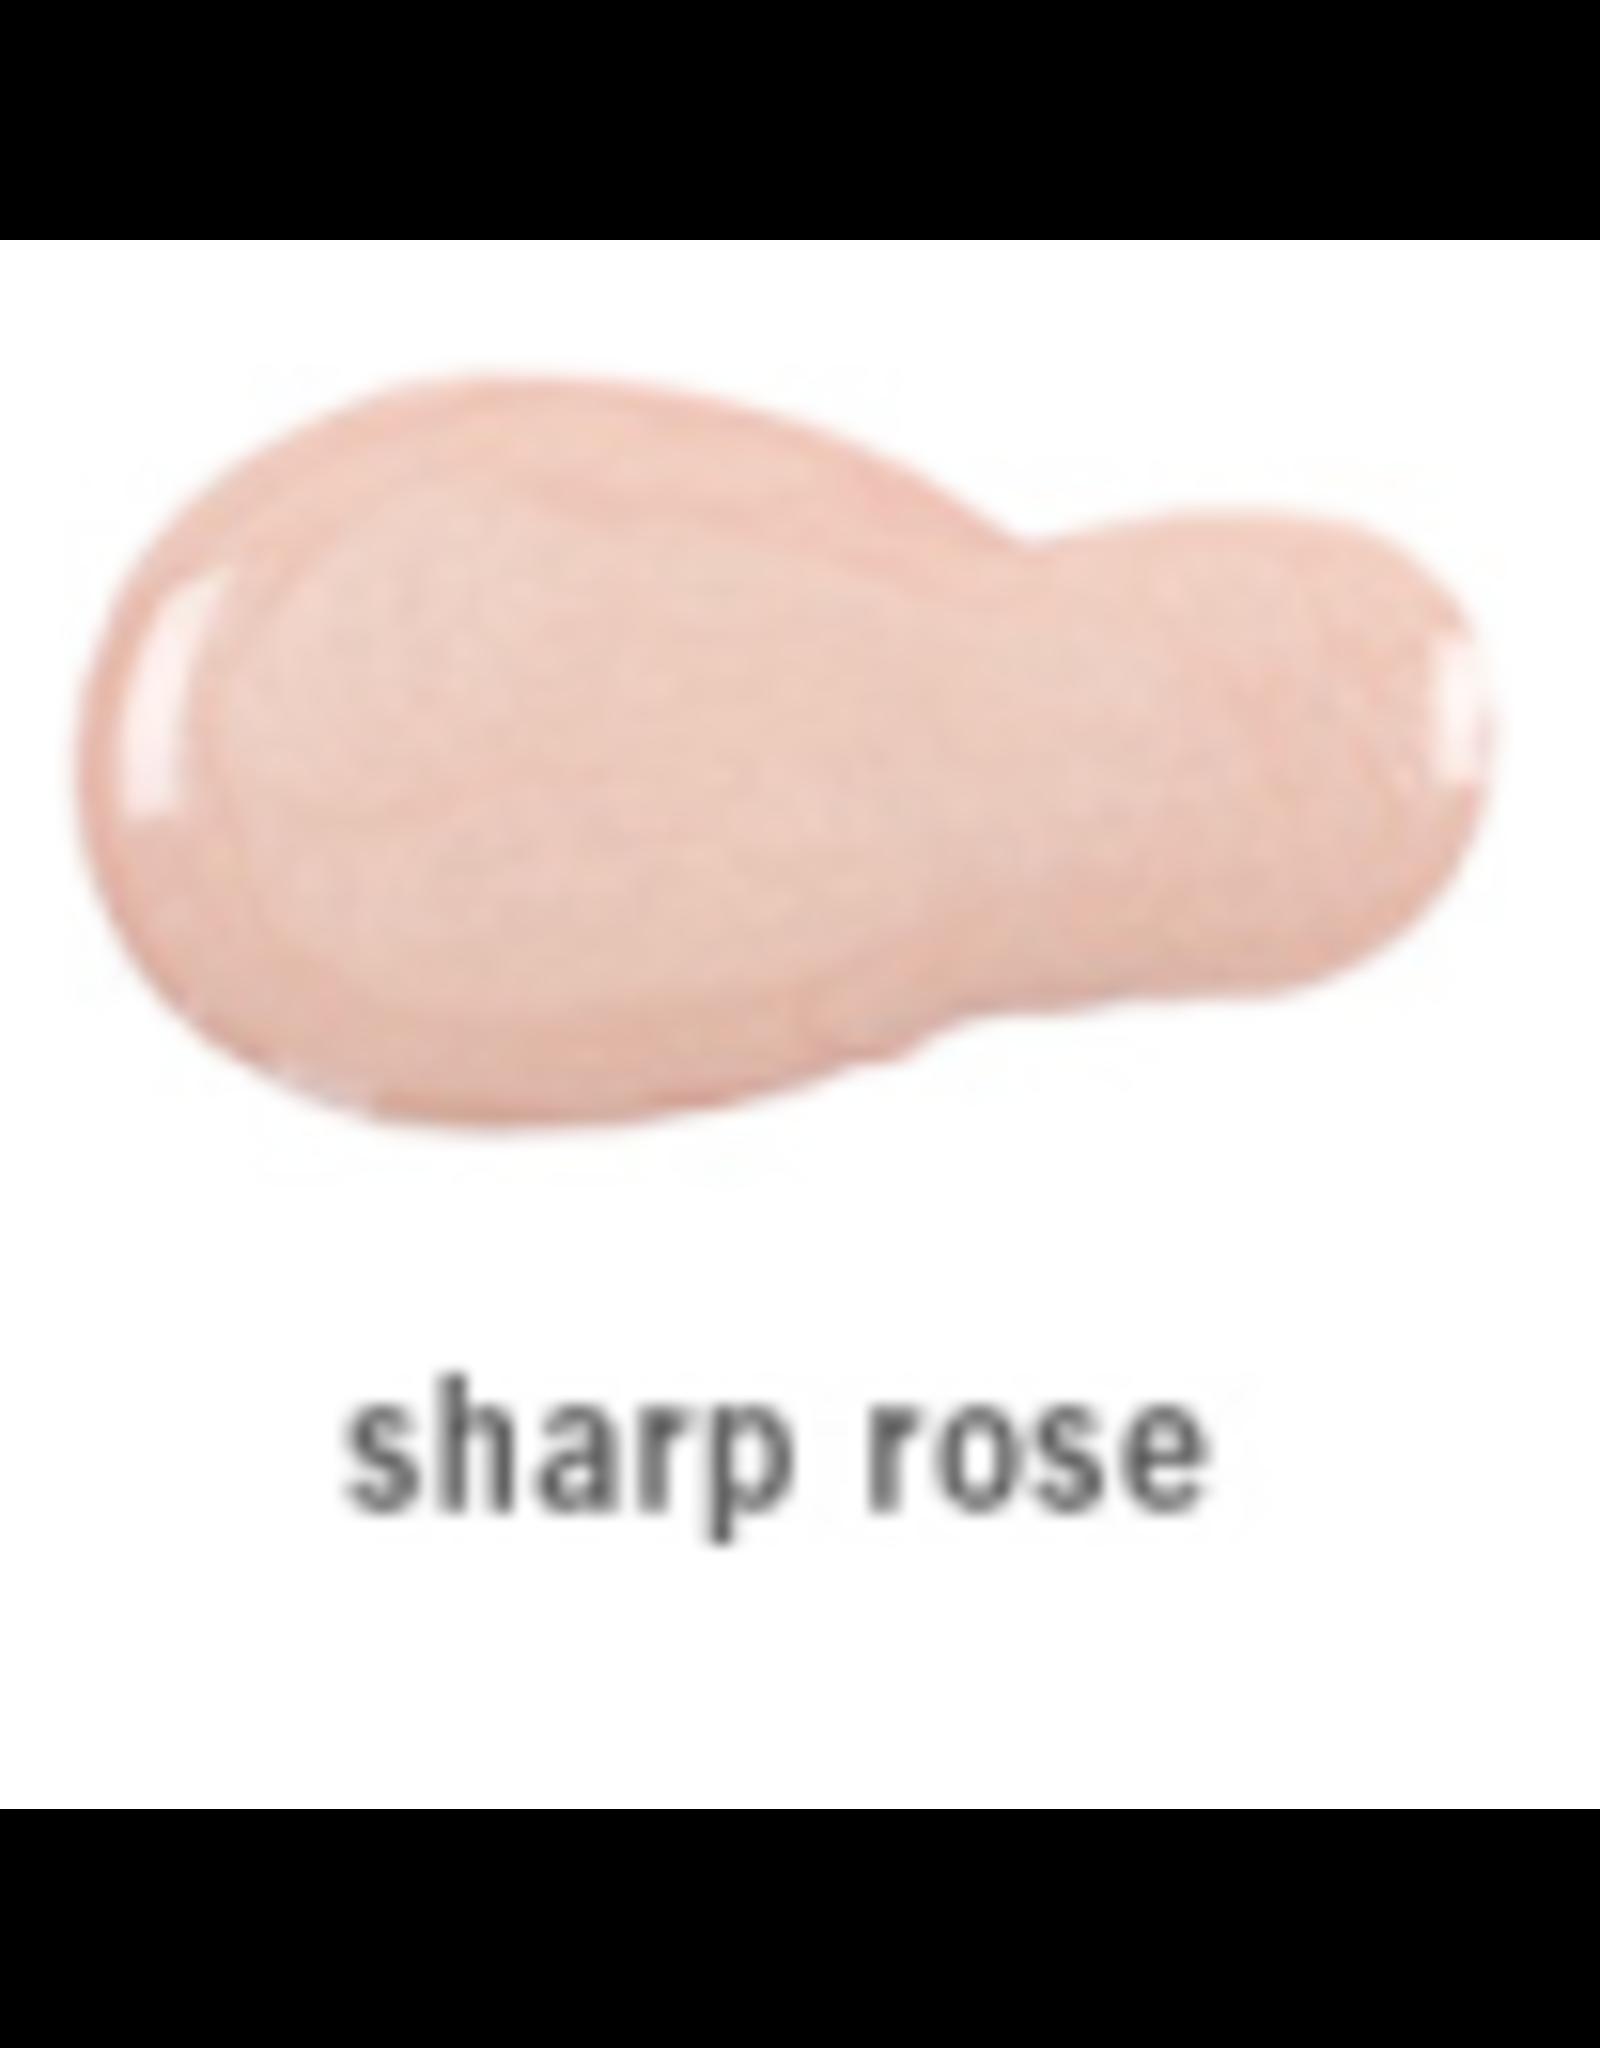 benecos NAIL POLISH sharp rosé - 8 FREE, 5ml